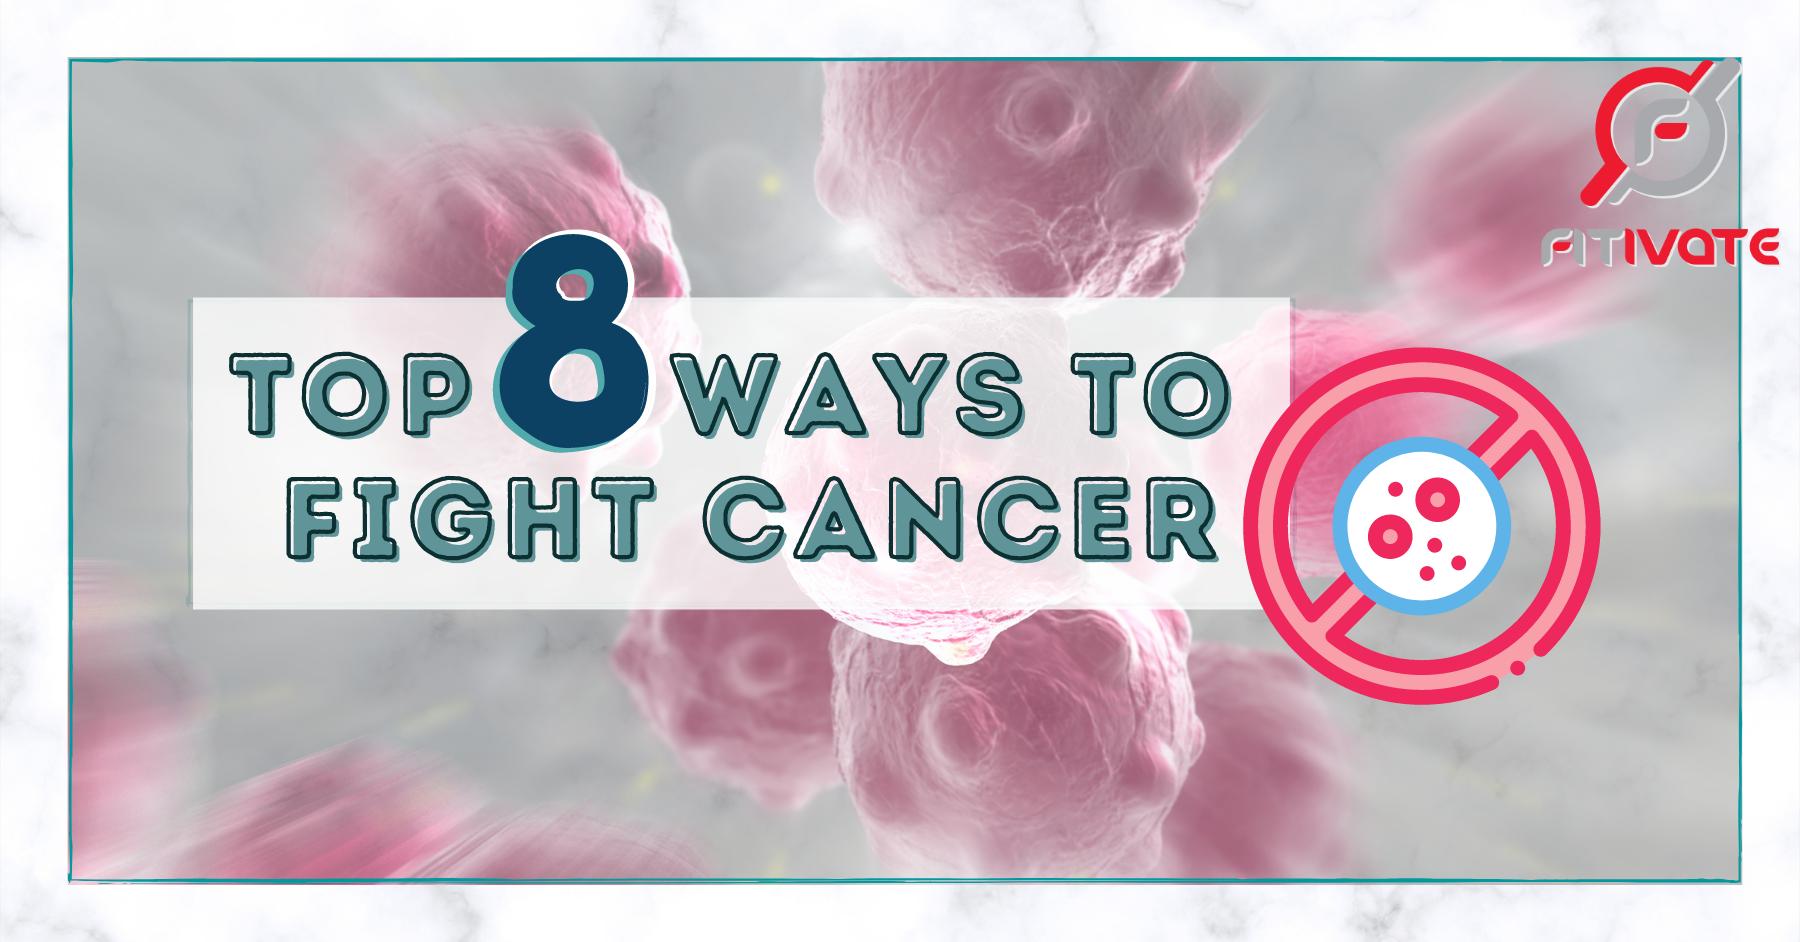 cancer prevention, cancer prevention strategies, cancer prevention tips, cancer prevention diet